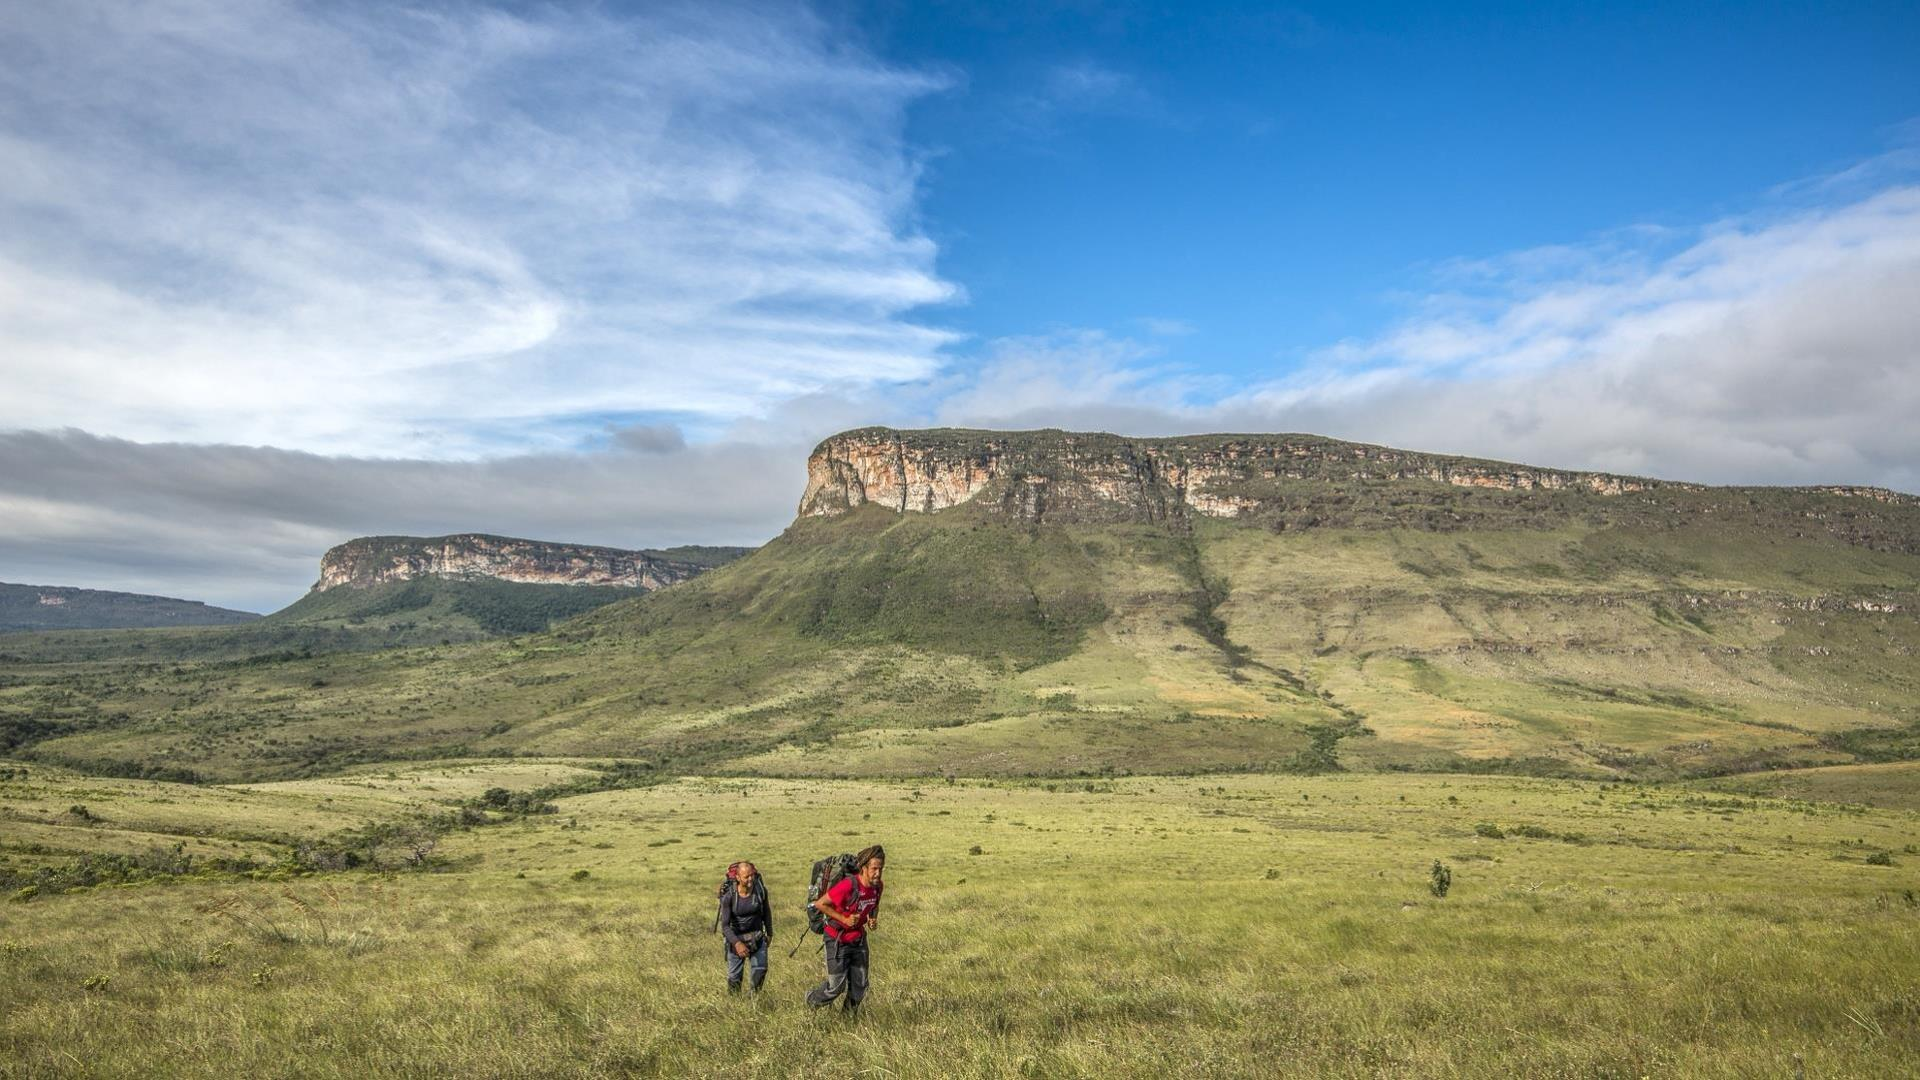 Brasilien Bahia: 5 Tage Reisebaustein - Chapada Diamantina Trekkingtour durch das Vale do Pati